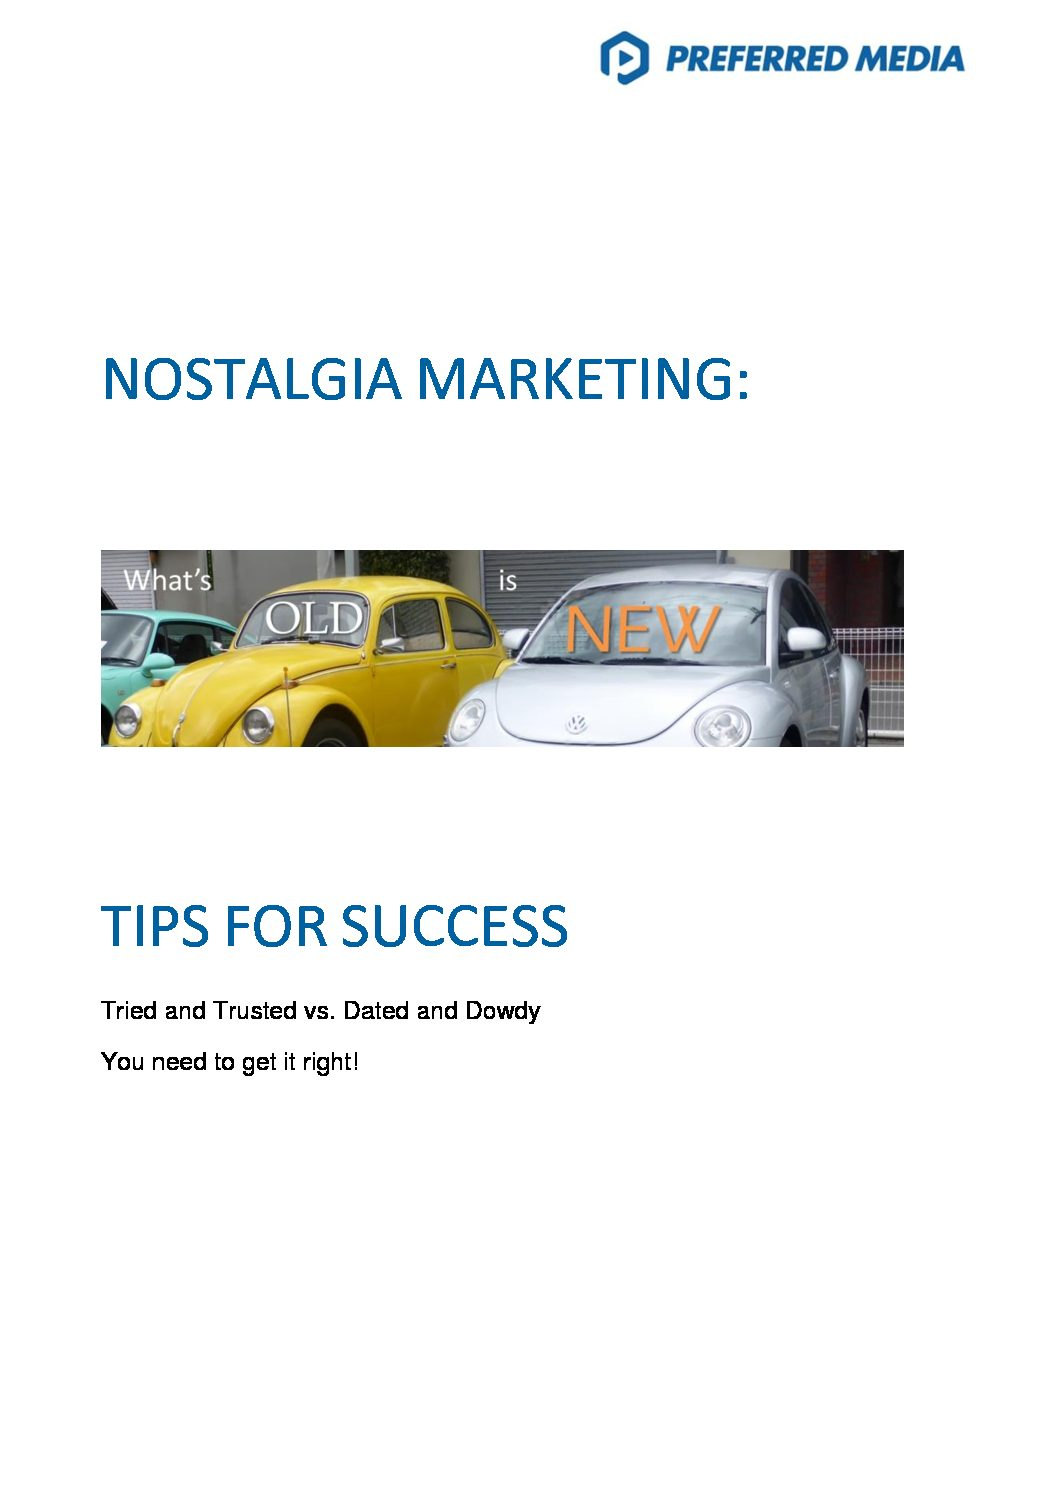 Nostalgia Marketing Tips For Success